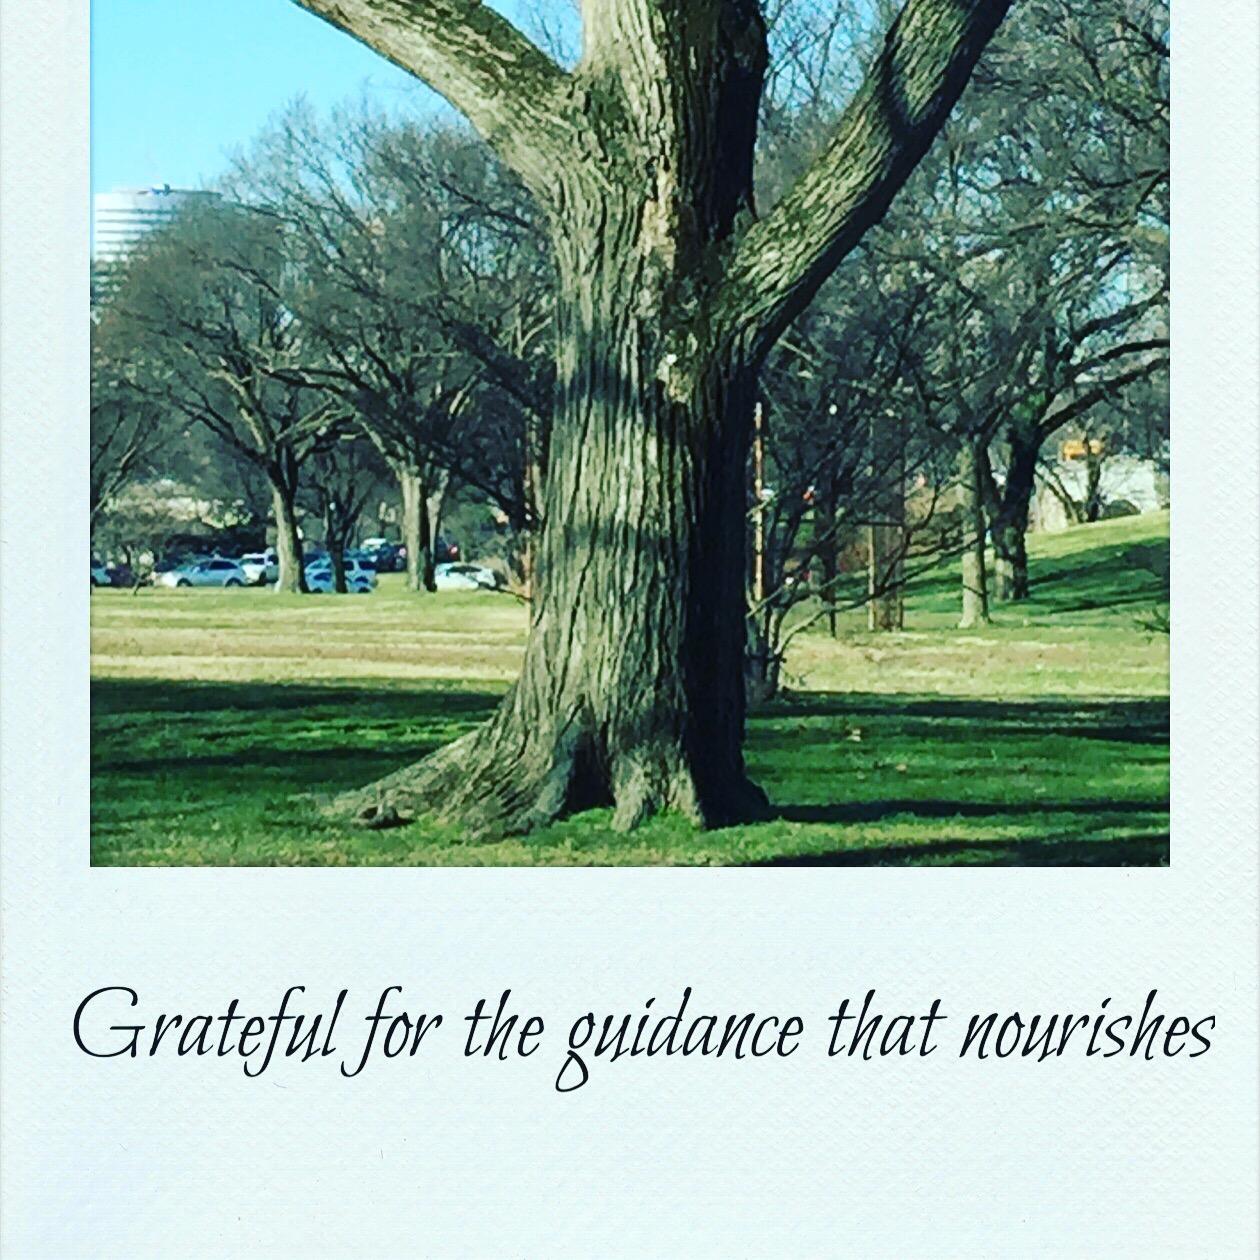 Grateful for being nourished